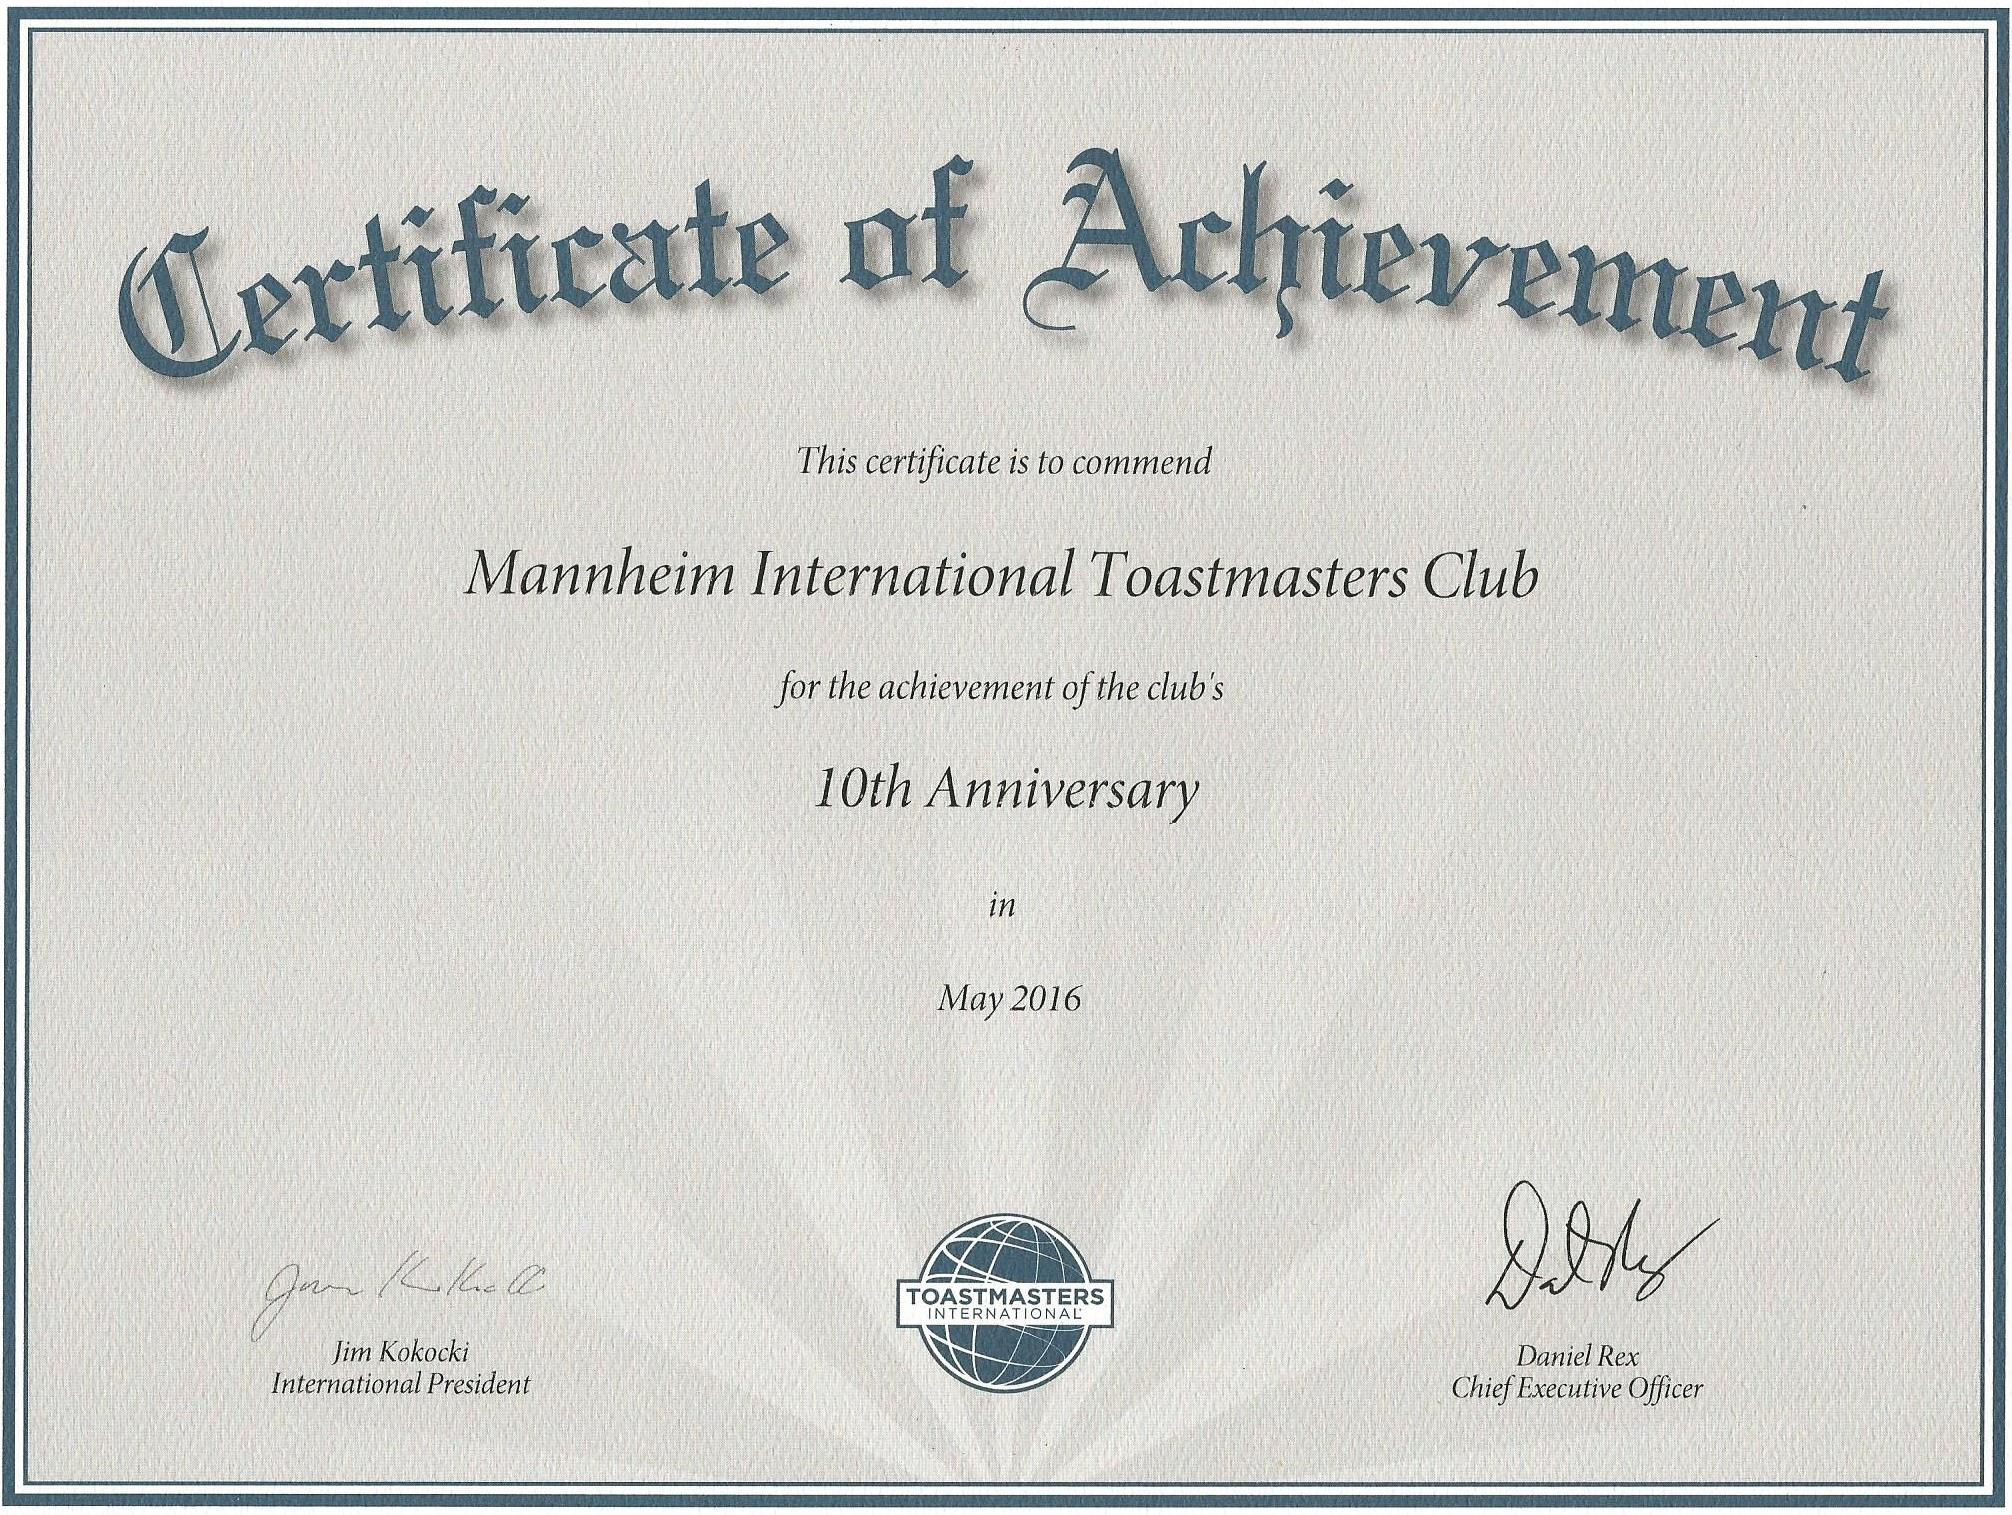 anniversary certificate - Acur.lunamedia.co